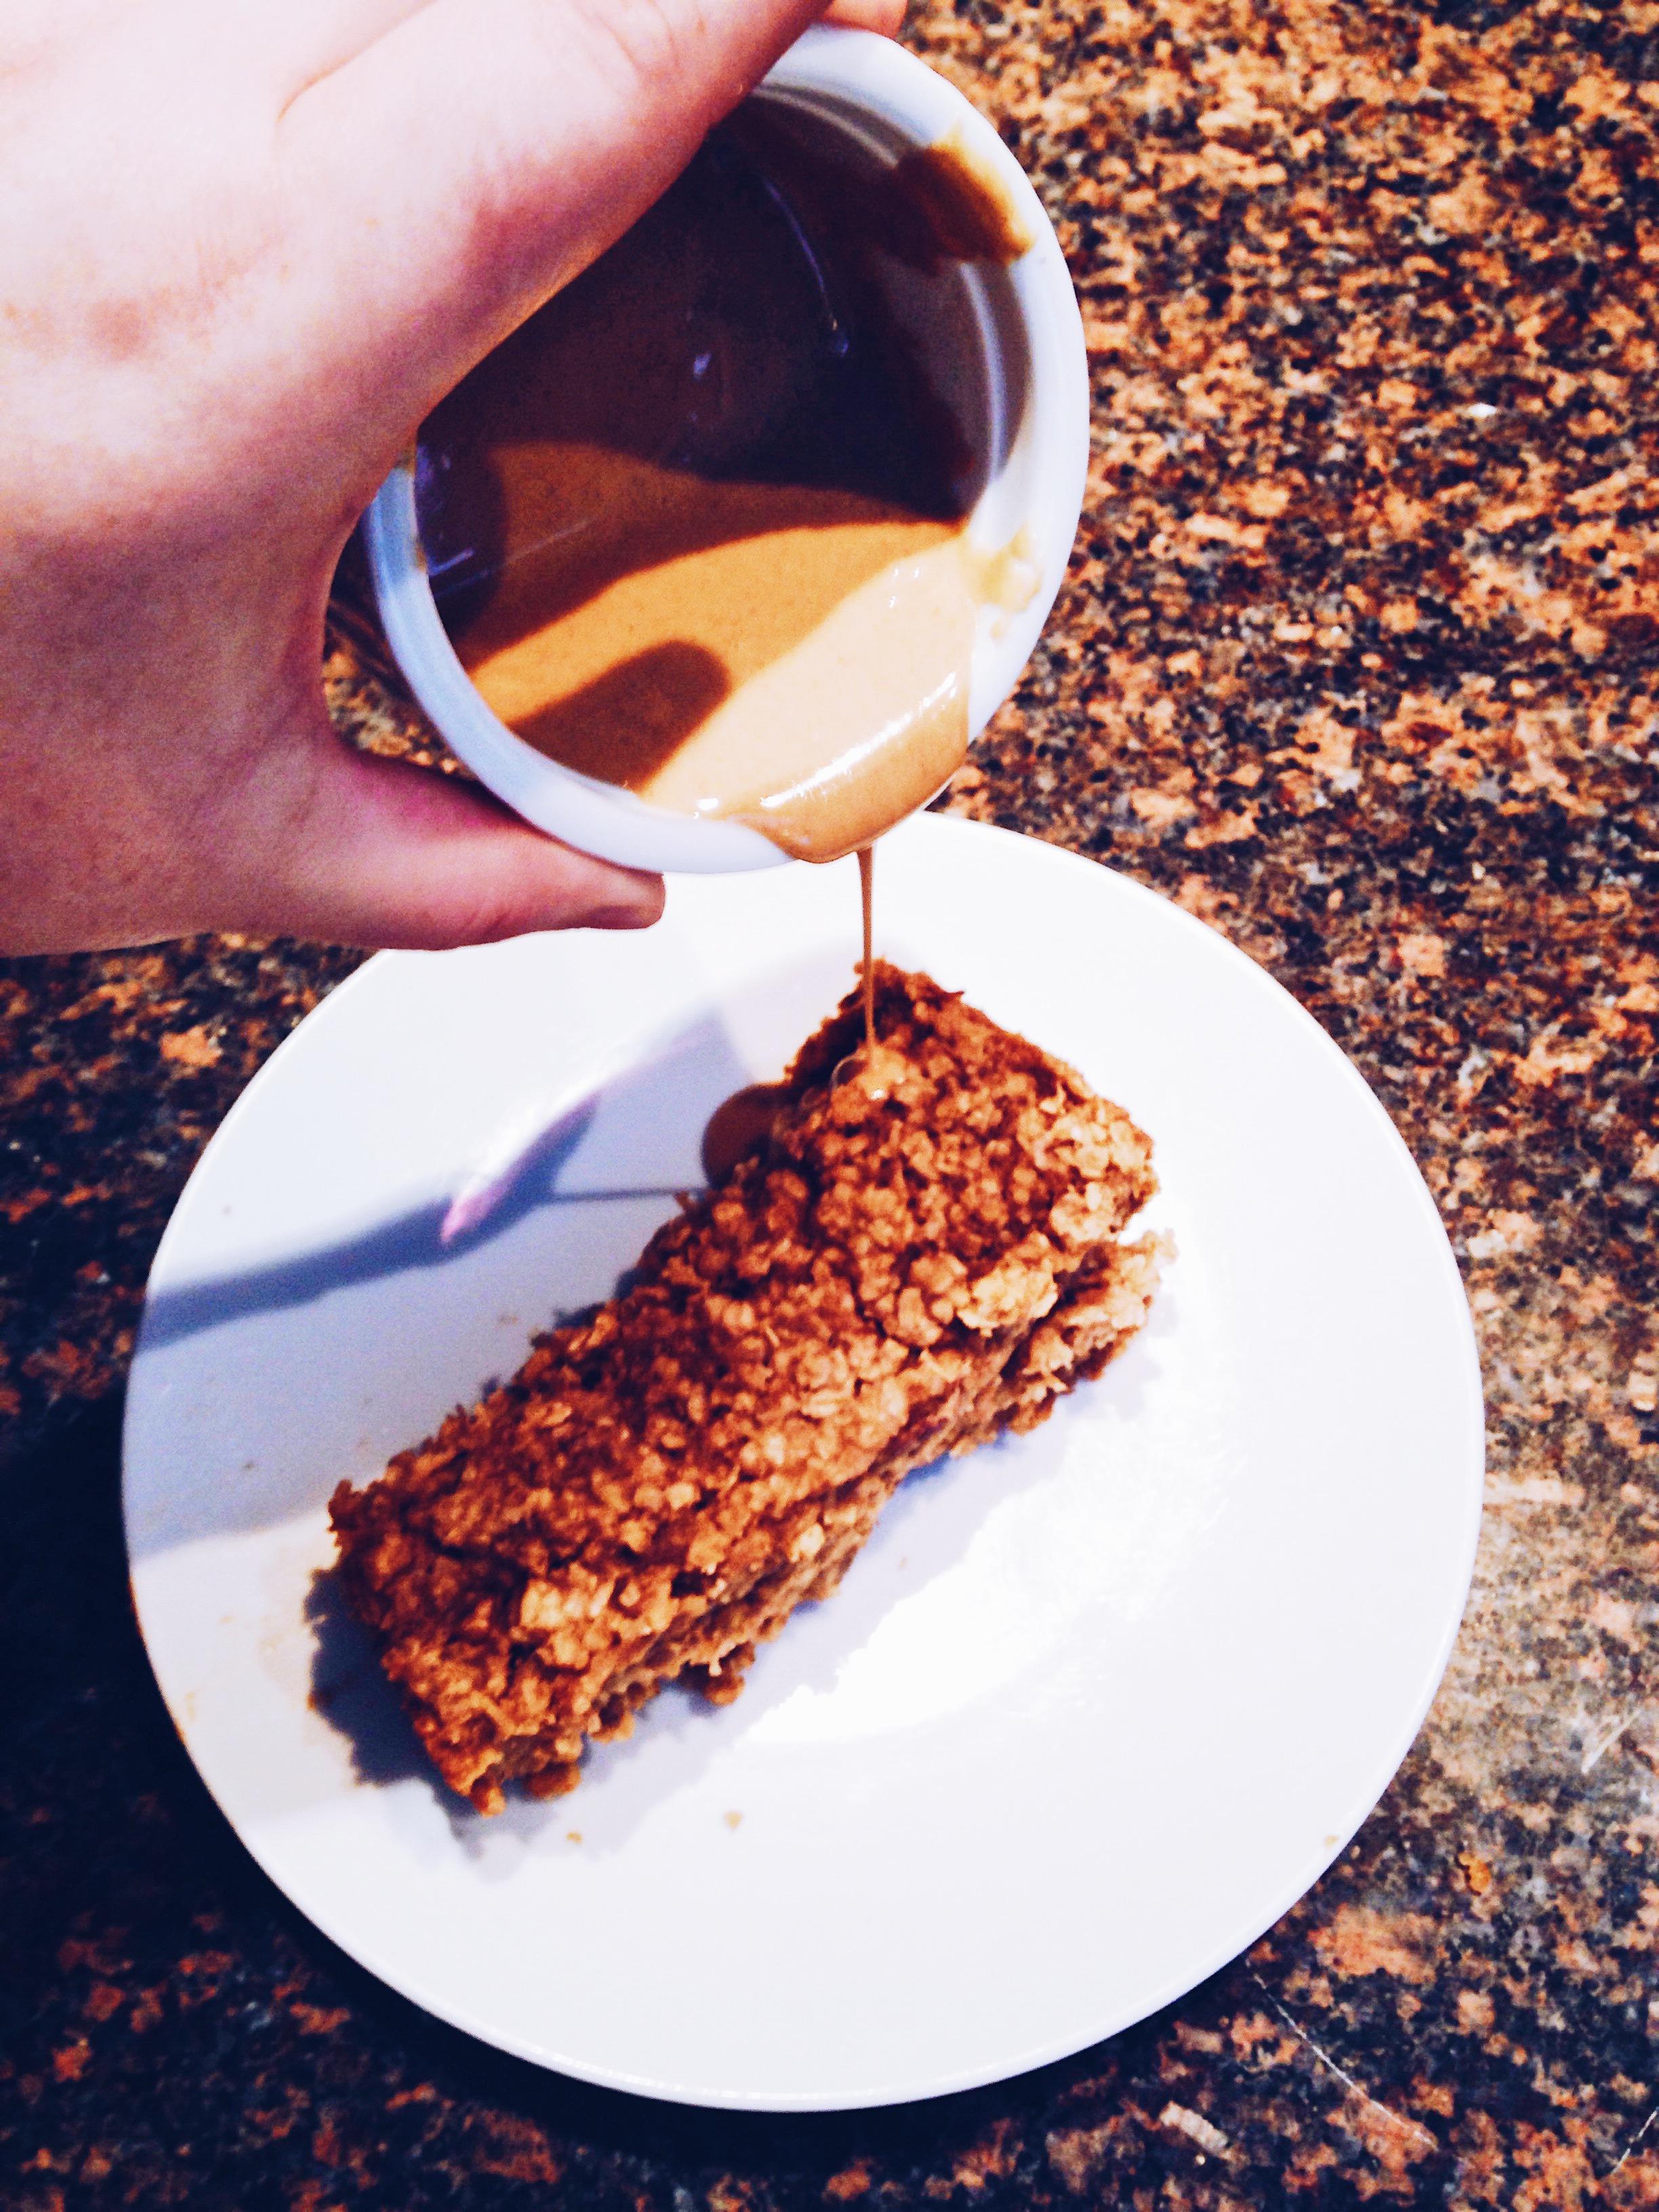 Homemade peanut butter banana baked oatmeal. Vegan. Gluten Free. Recipe. Breakfast